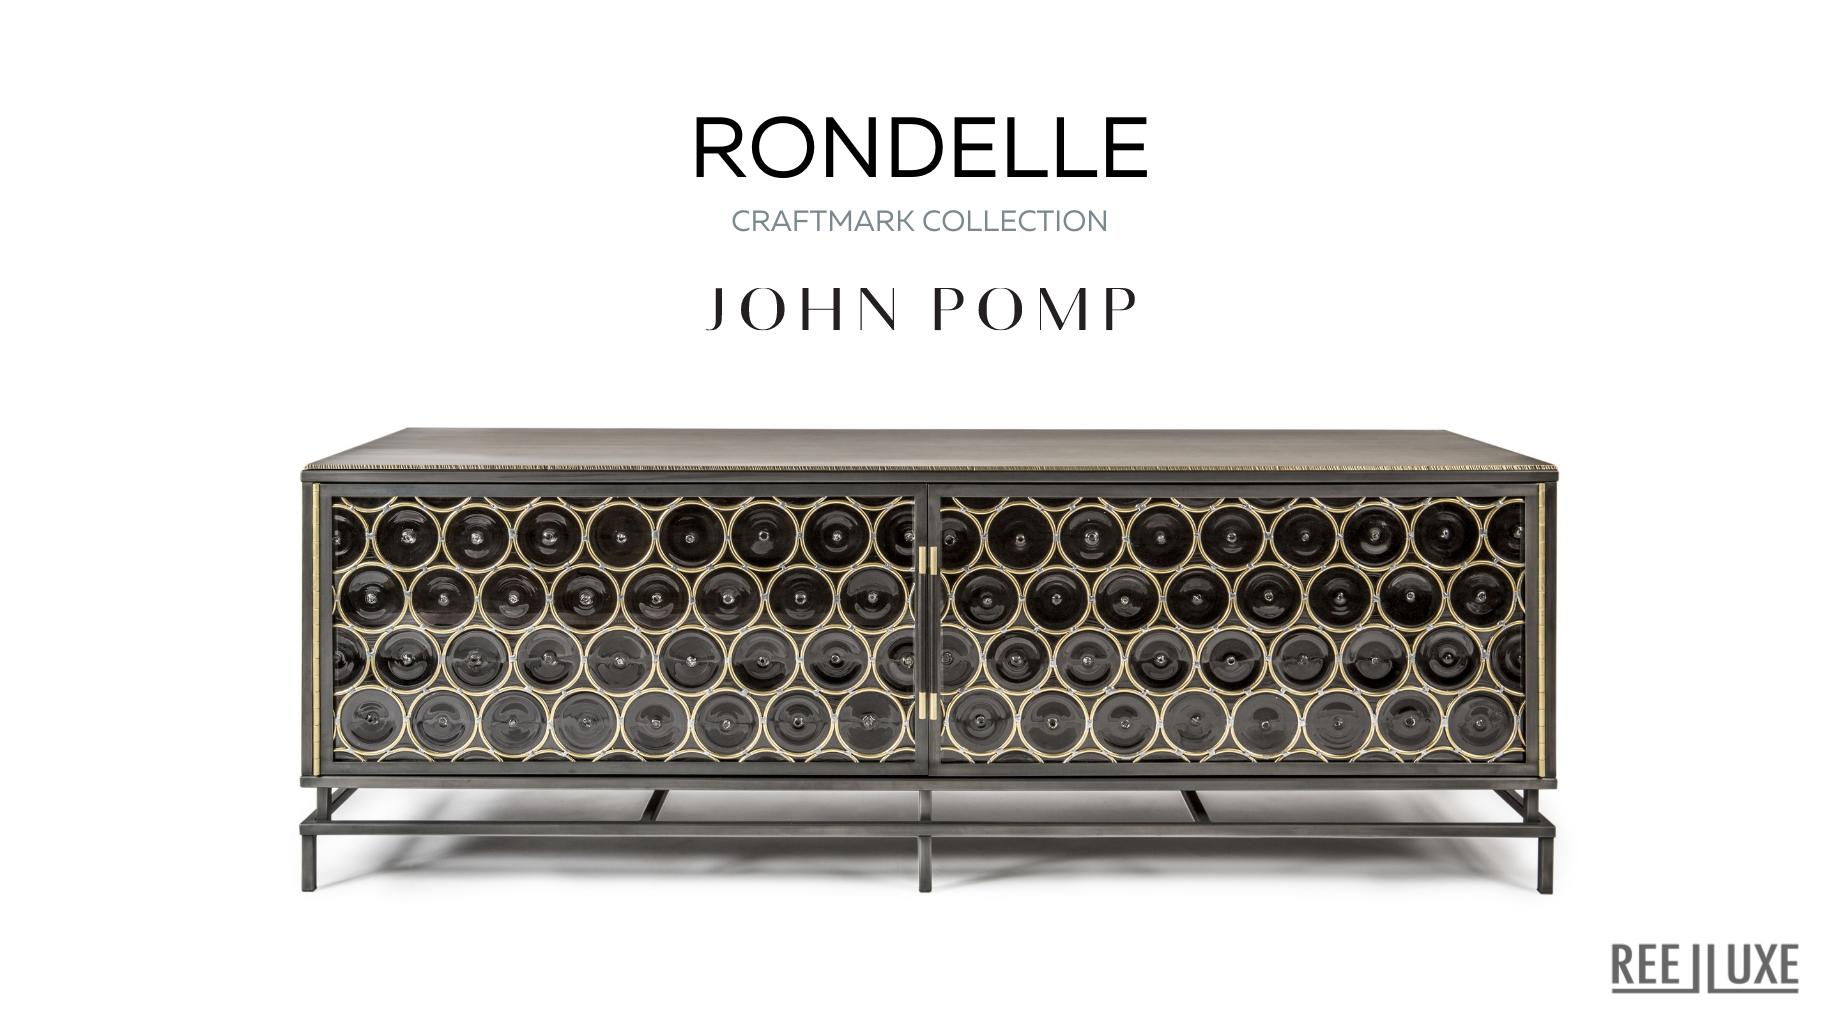 RONDELLE Craftmark Luxury Furniture Collection - John Pomp